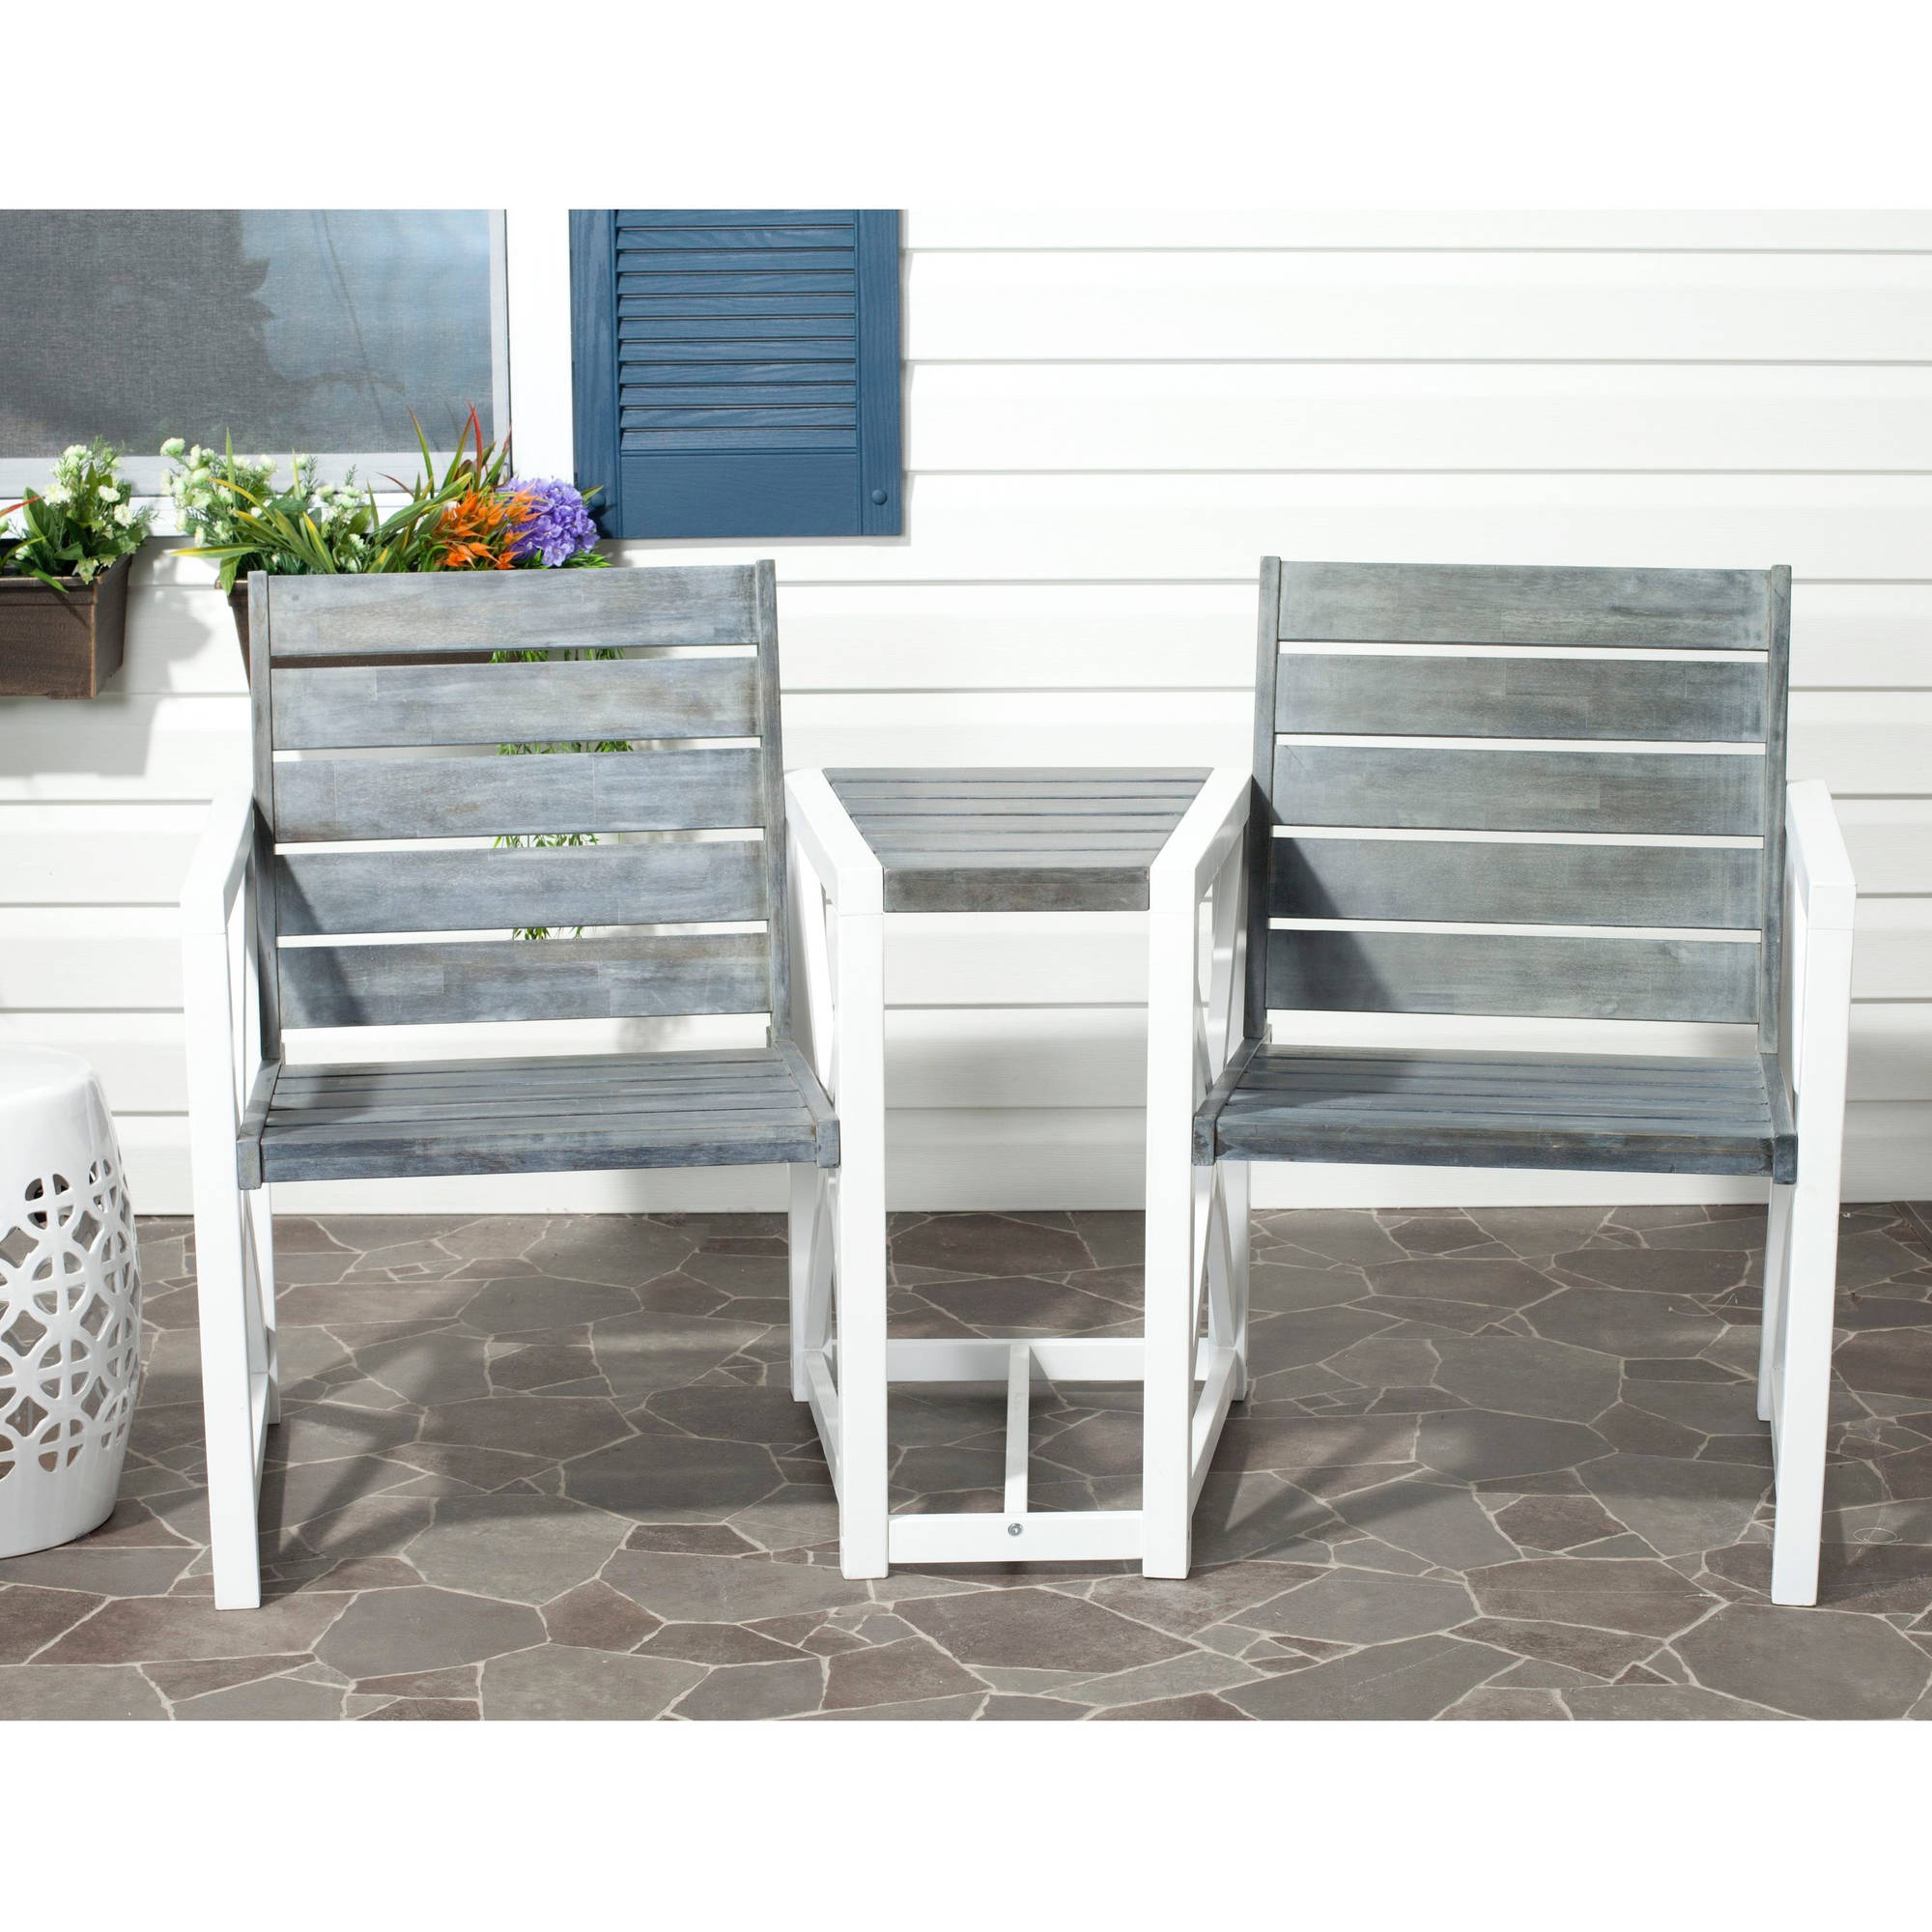 Safavieh Jovanna 2-Seat Bench